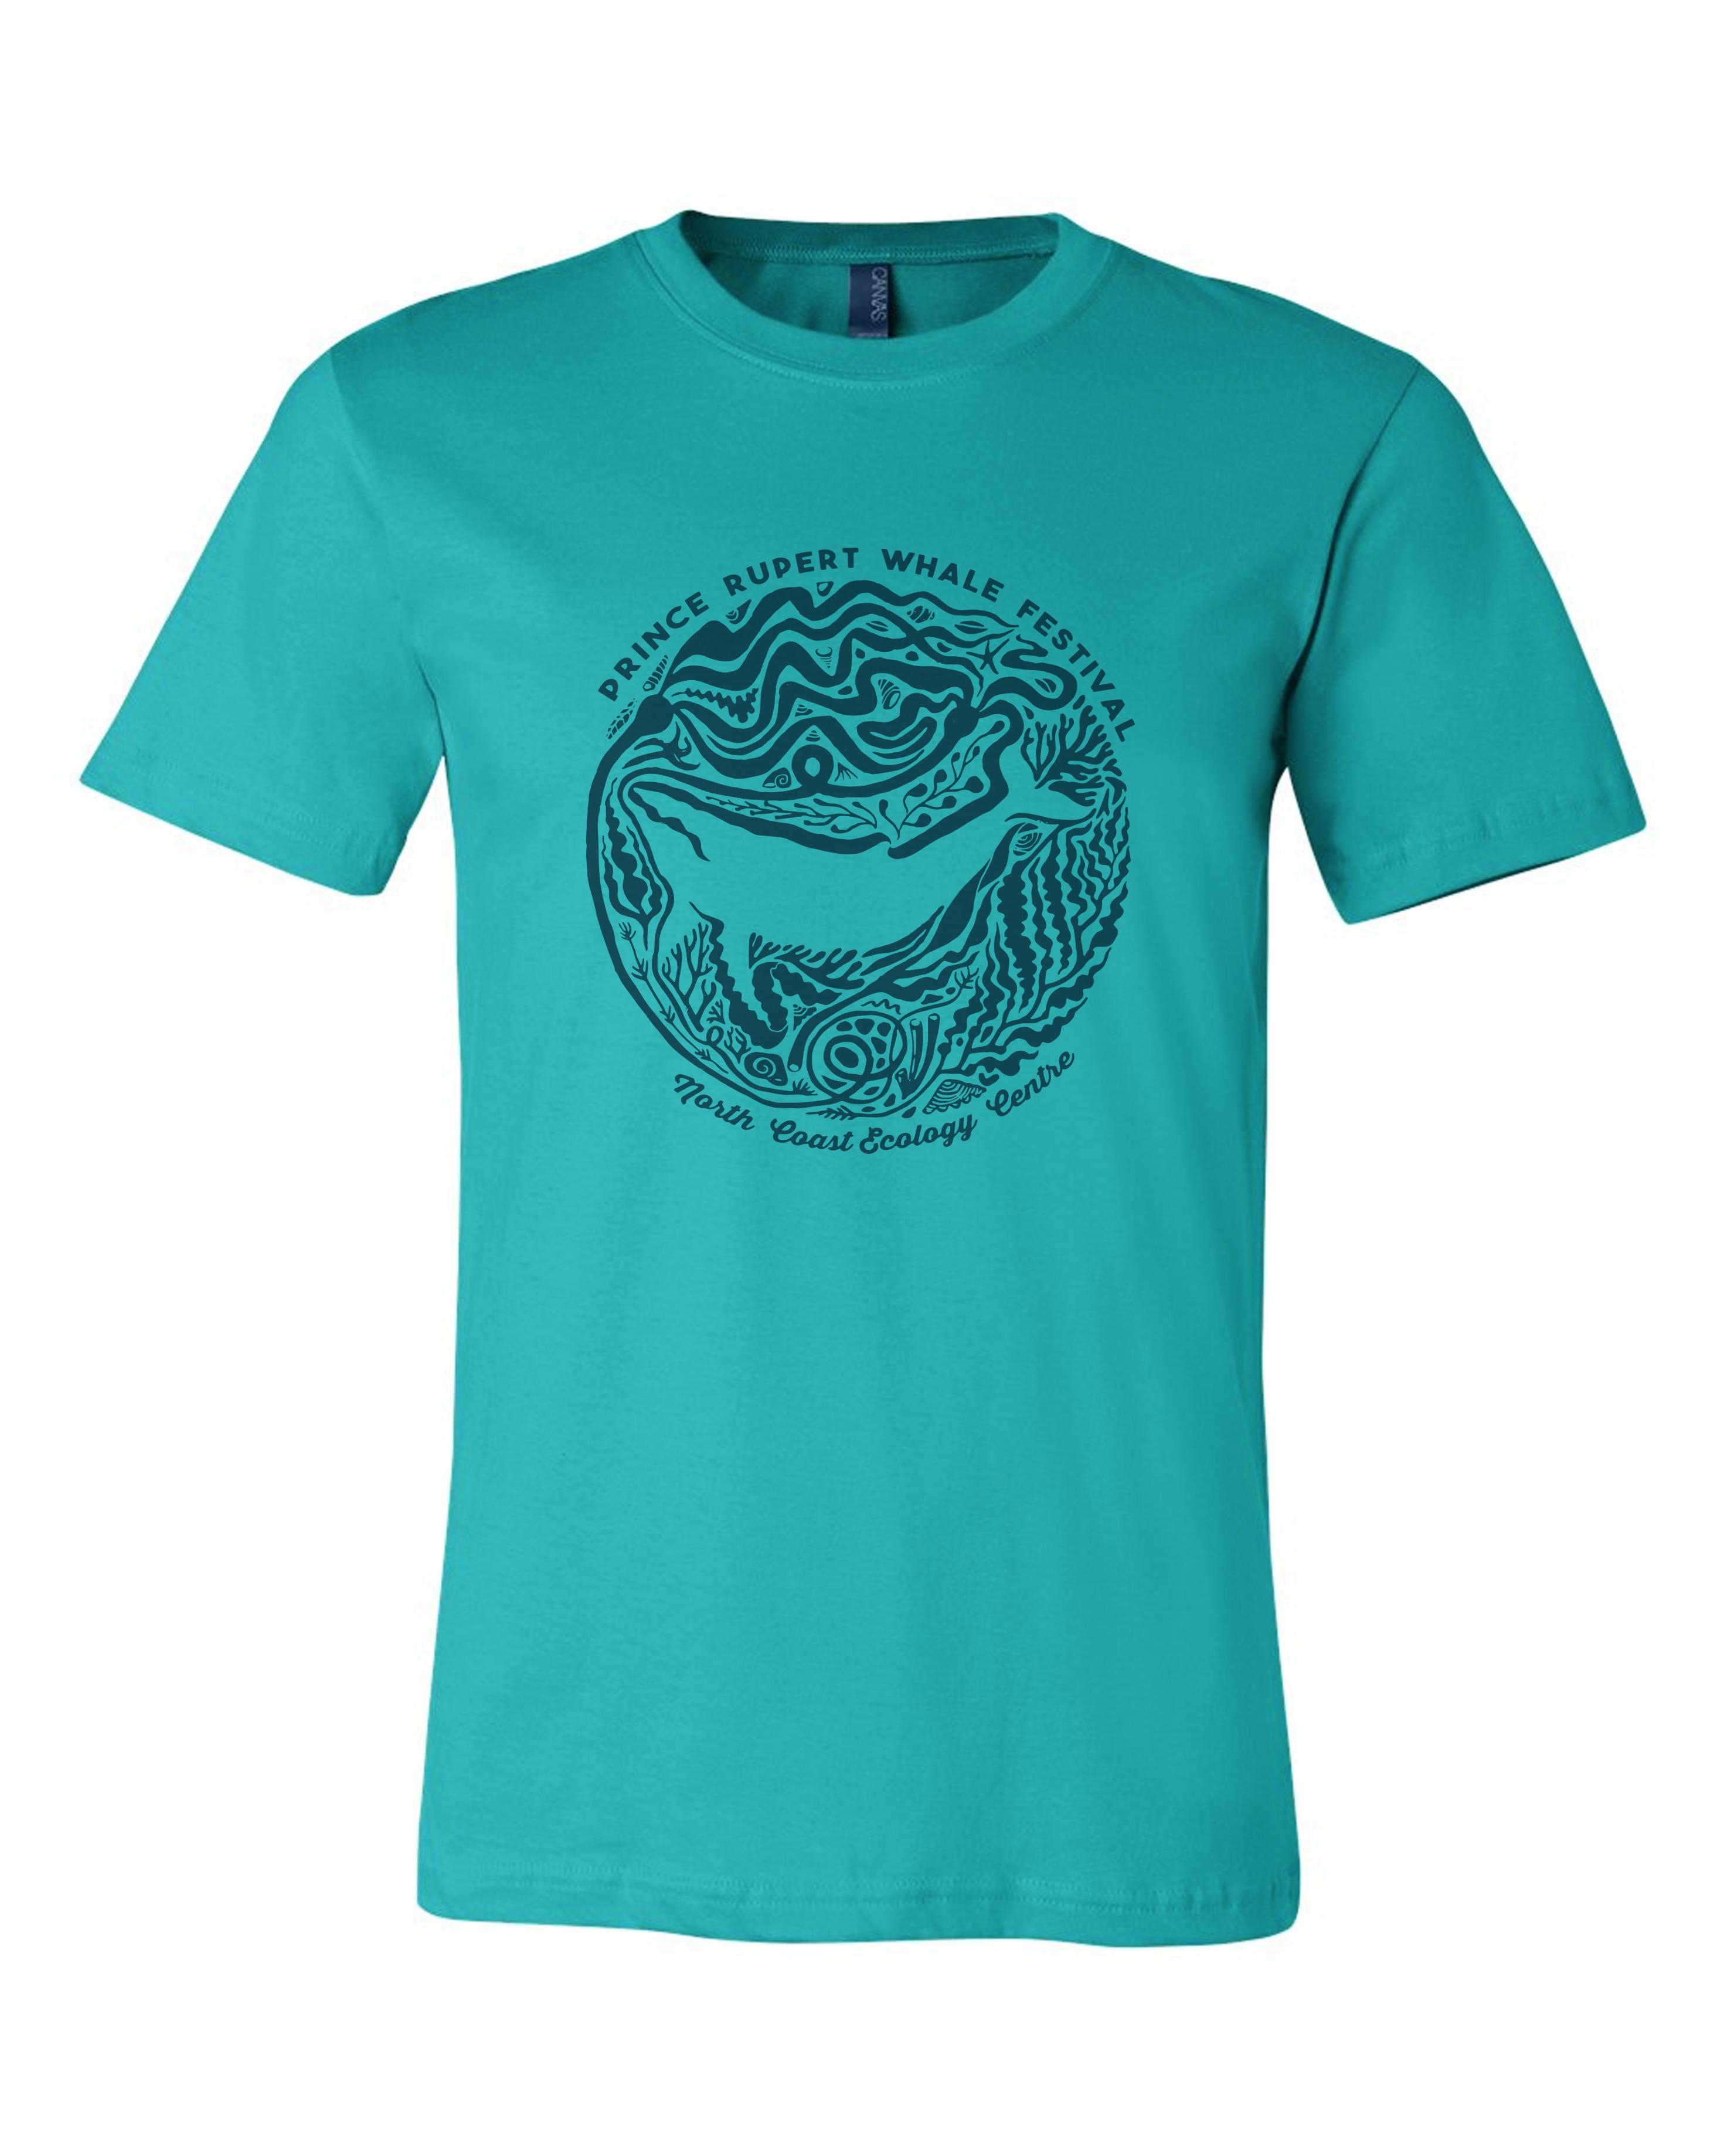 Prince Rupert Whale Festival T-shirt